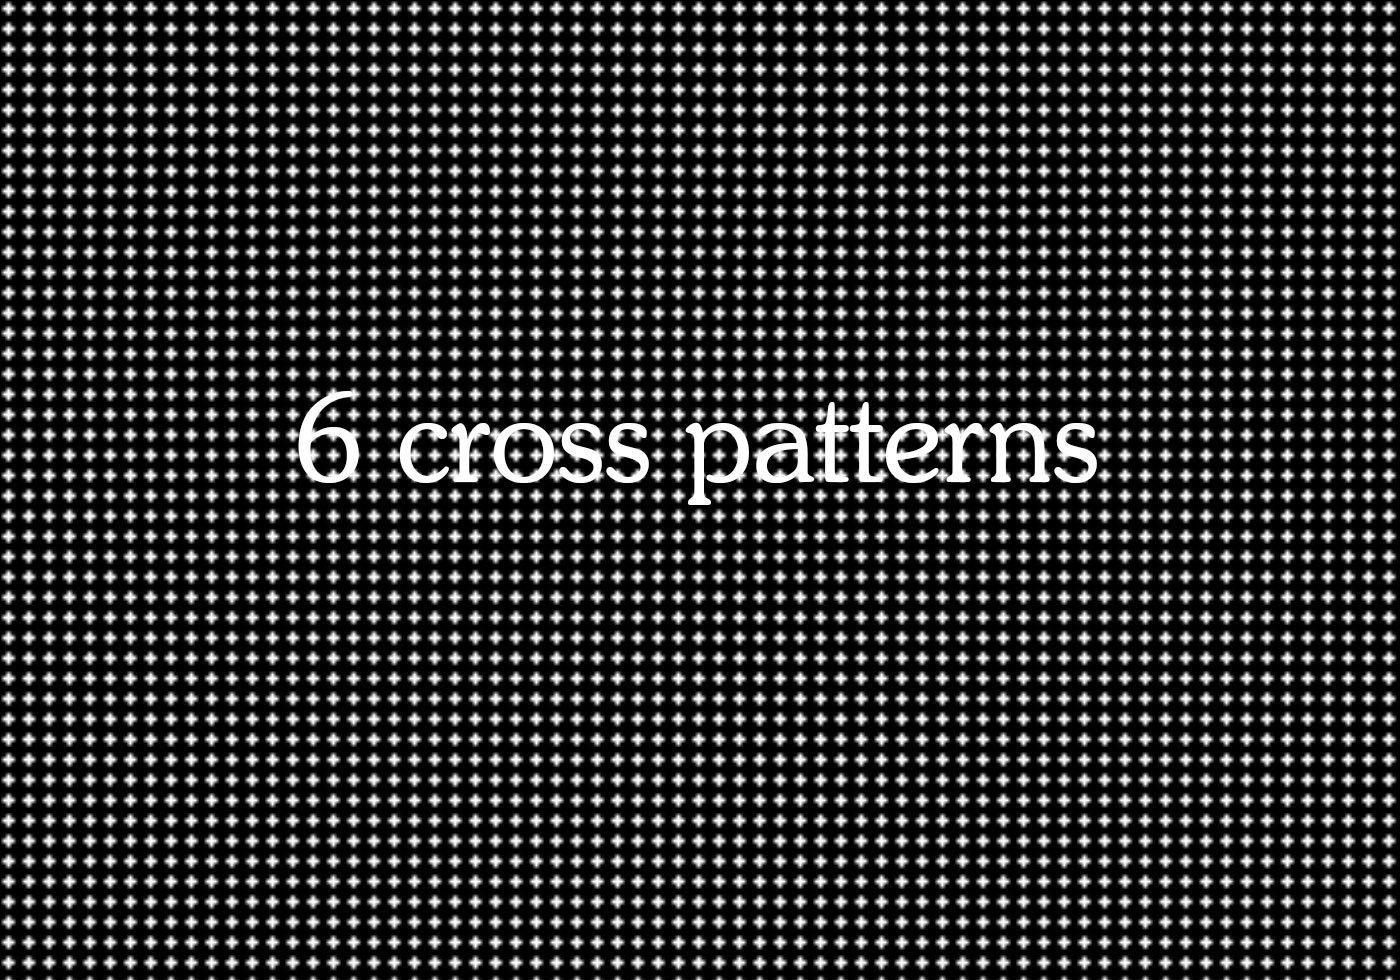 Cross-patterns